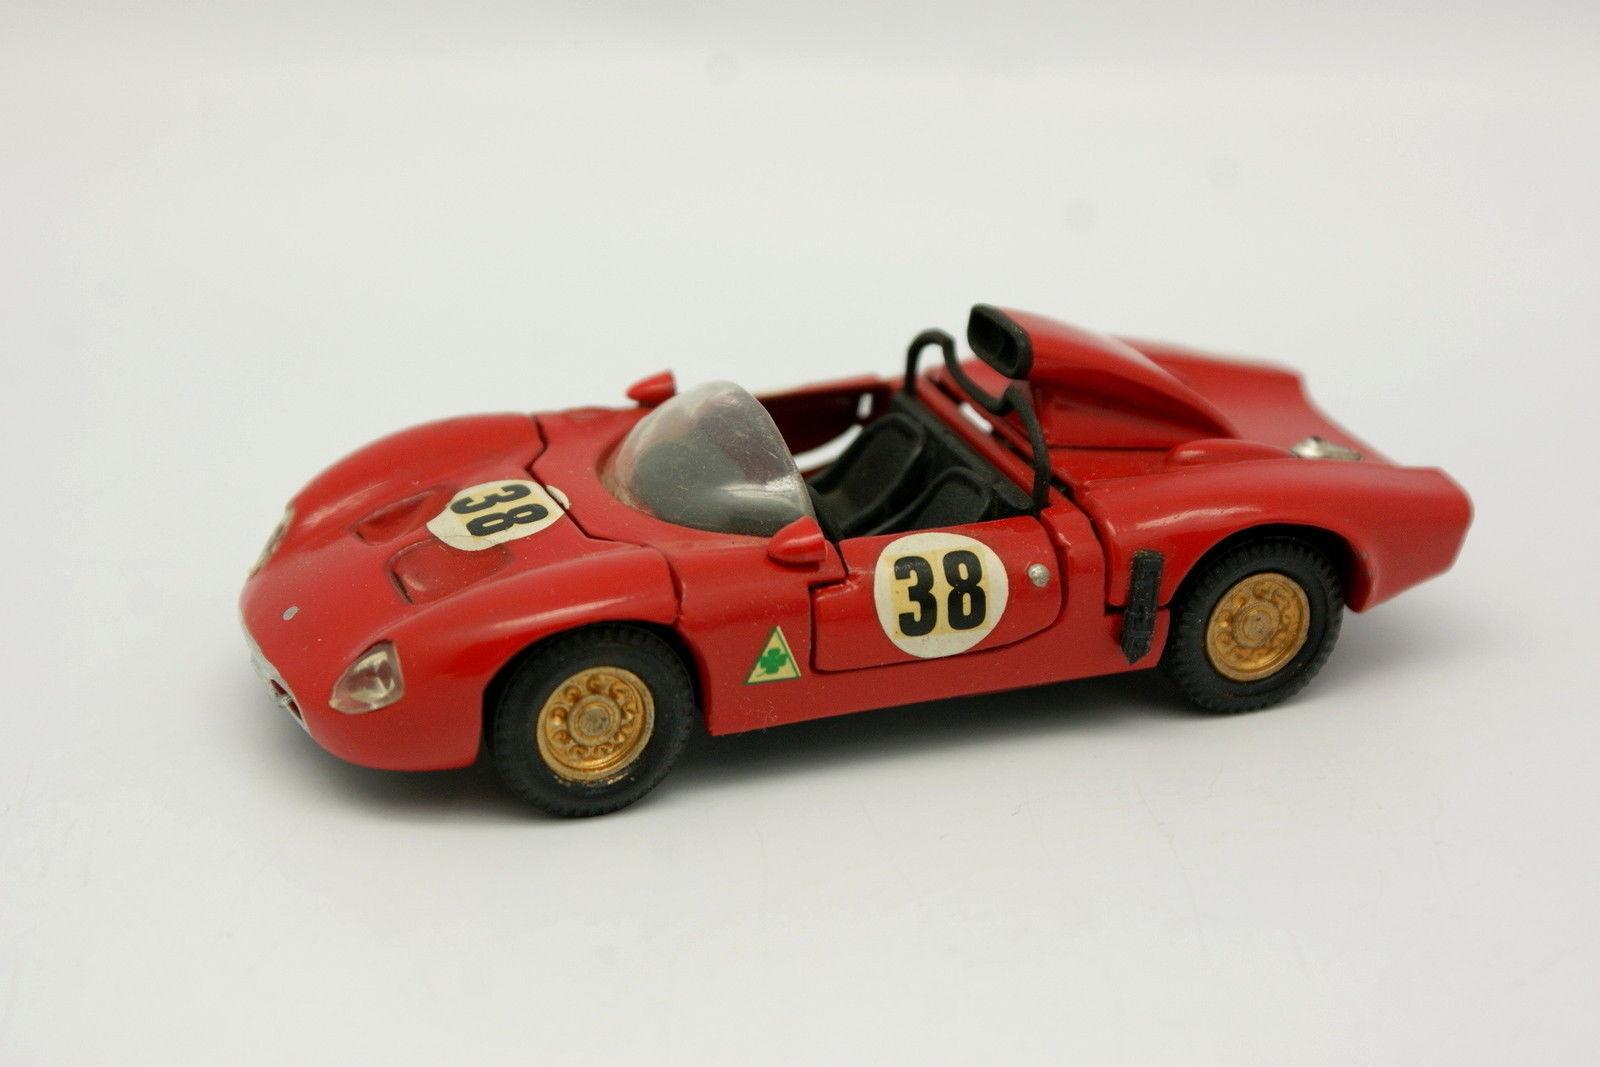 tienda en linea Mercury Transkit 1 43 - Alfa Alfa Alfa Romeo 33 Le Mans 1967 N º 38  precios mas baratos